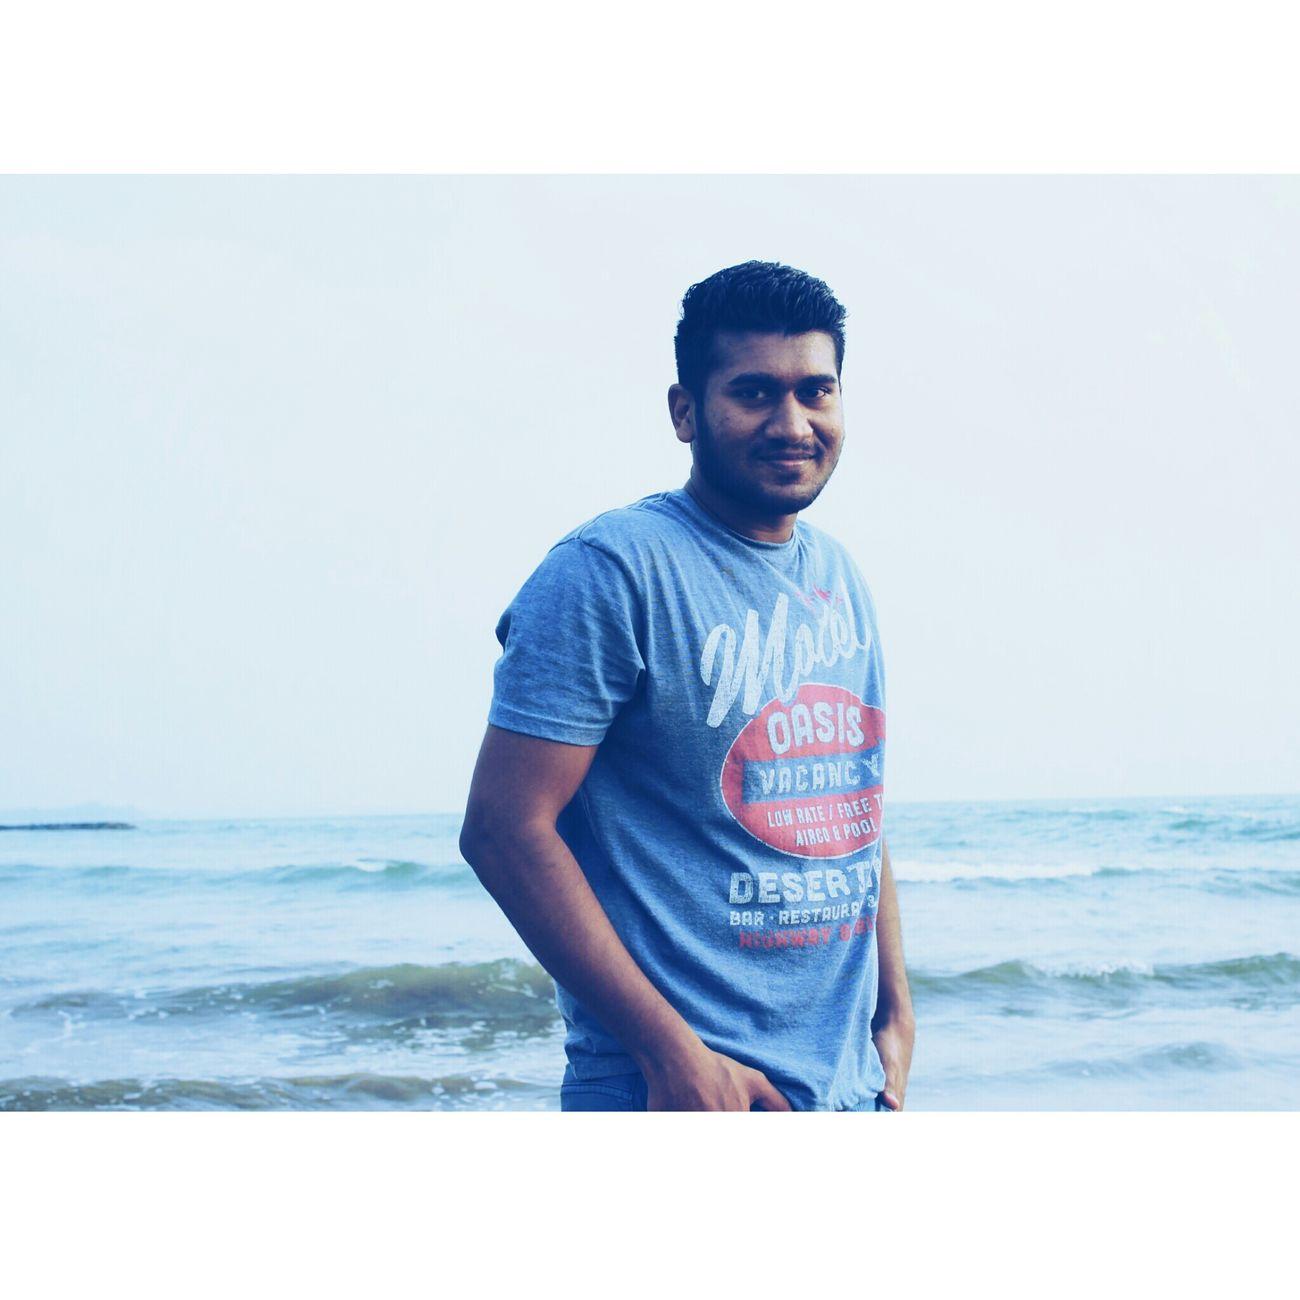 SriLanka Srilankaboy Beach Goodtime ❤️ Simpleme Happyme Singlelife  Singleboy Single